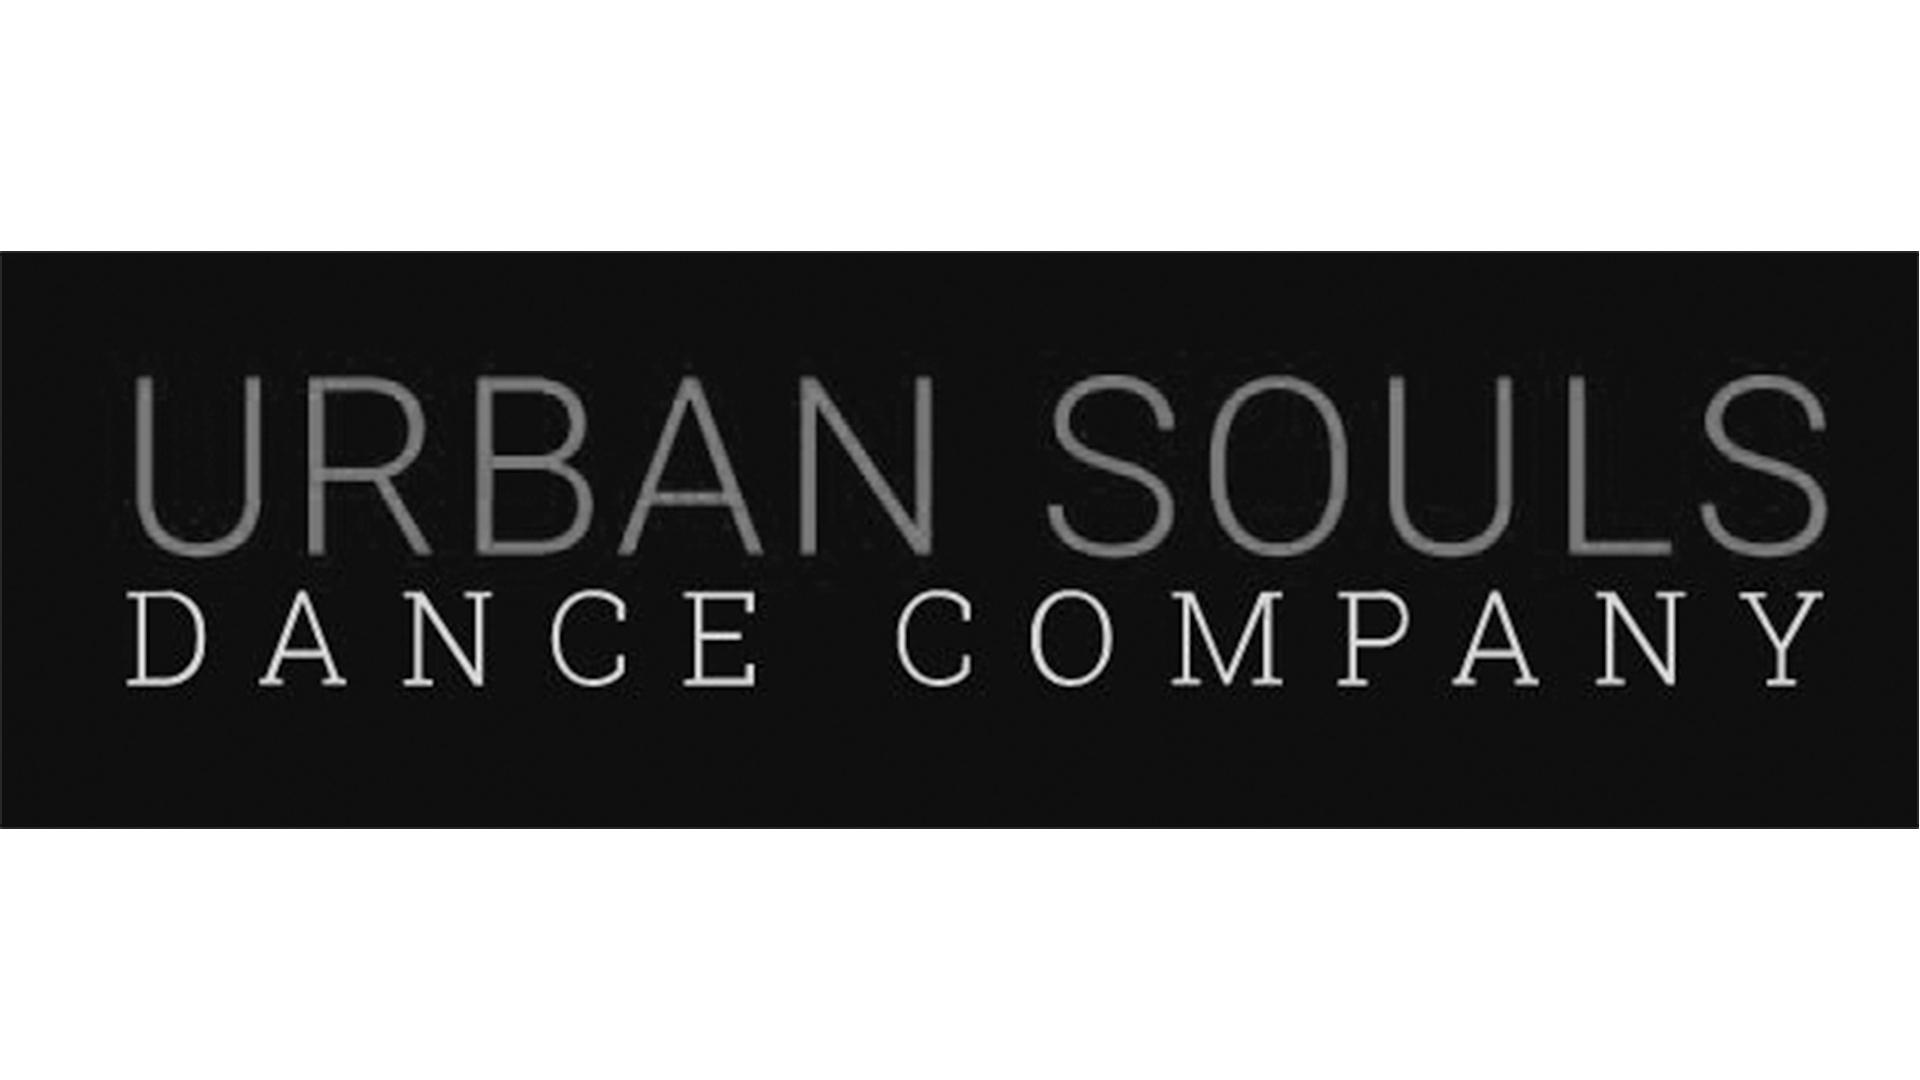 Urban Souls Dance Company_Partner_1920x1080